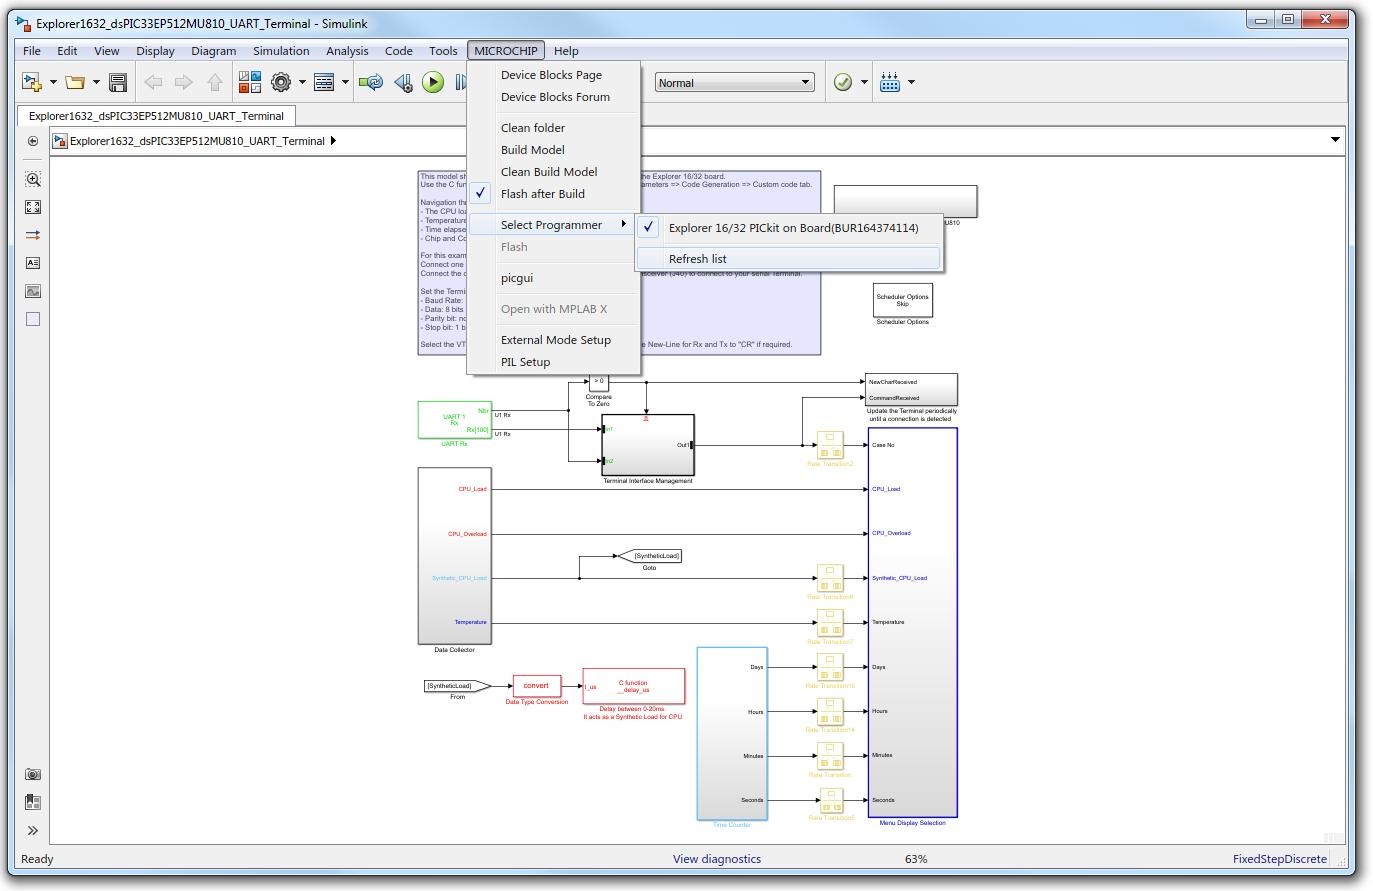 UartTerminalModel-ProgrammerSelect.PNG